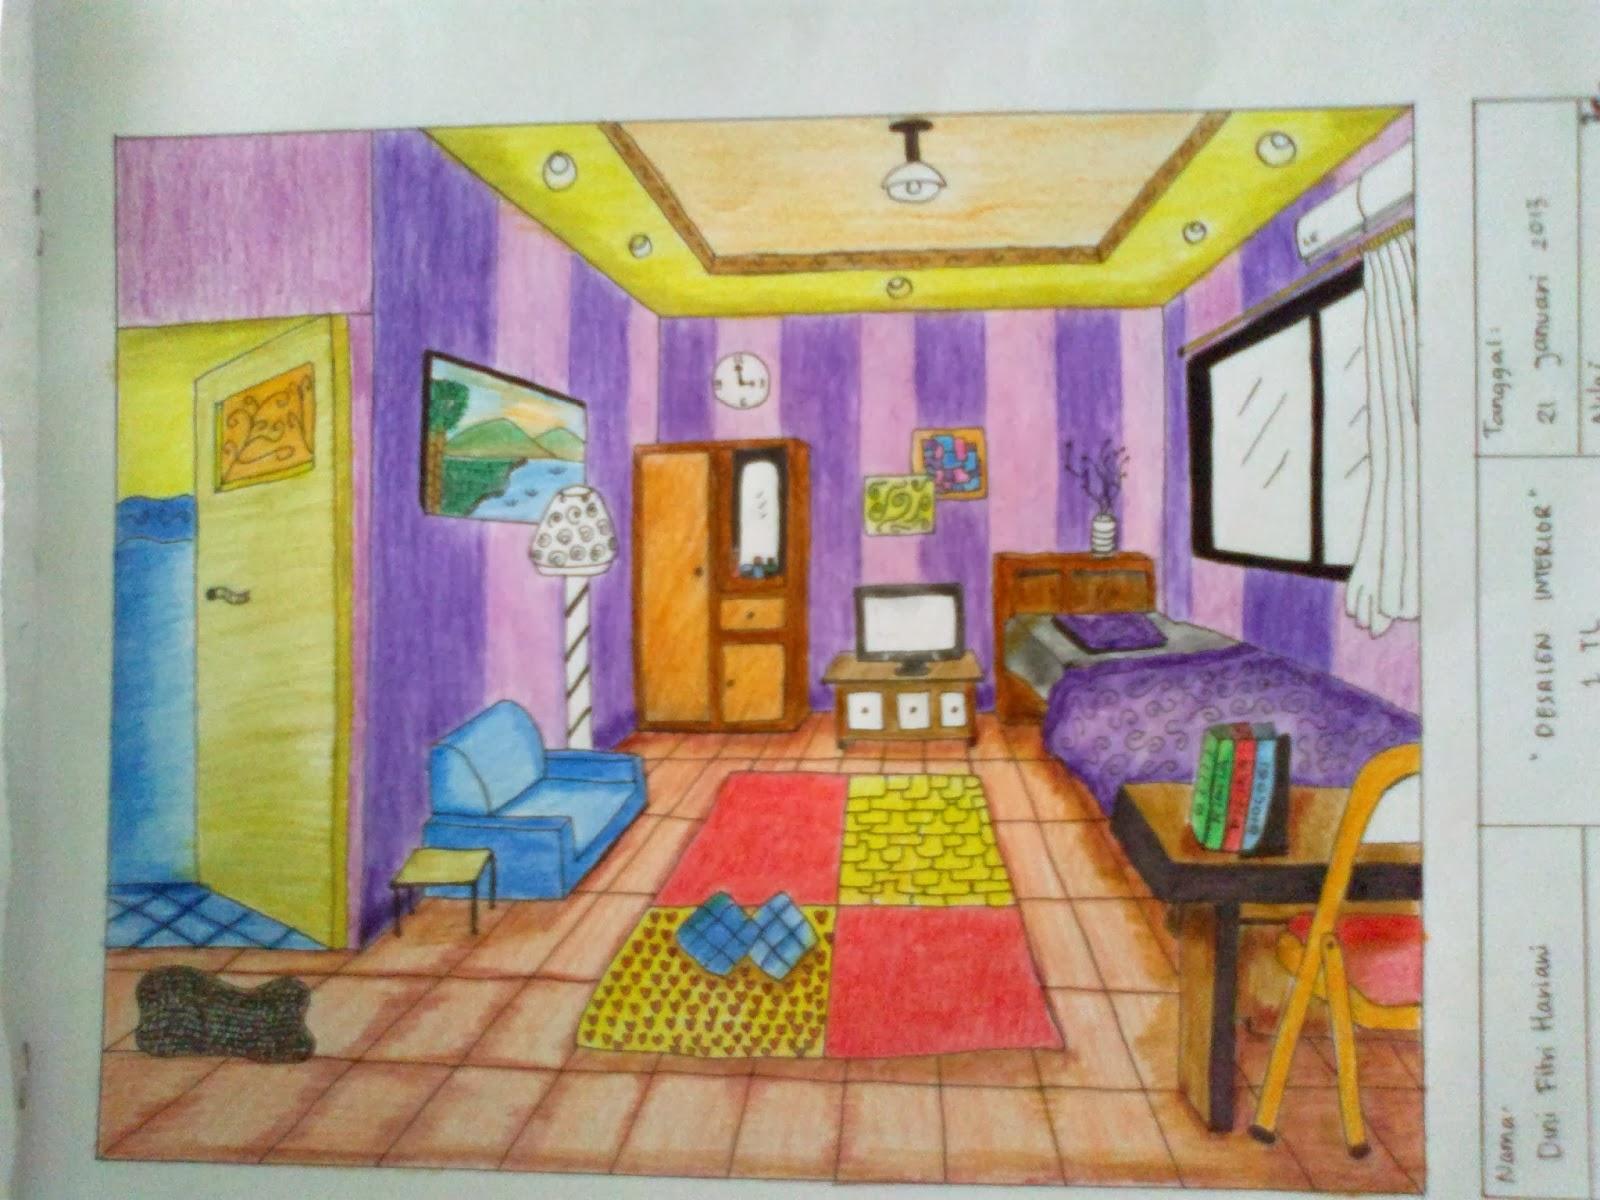 Gambar Prespektif Interior Kamar Tidur Interior Rumah